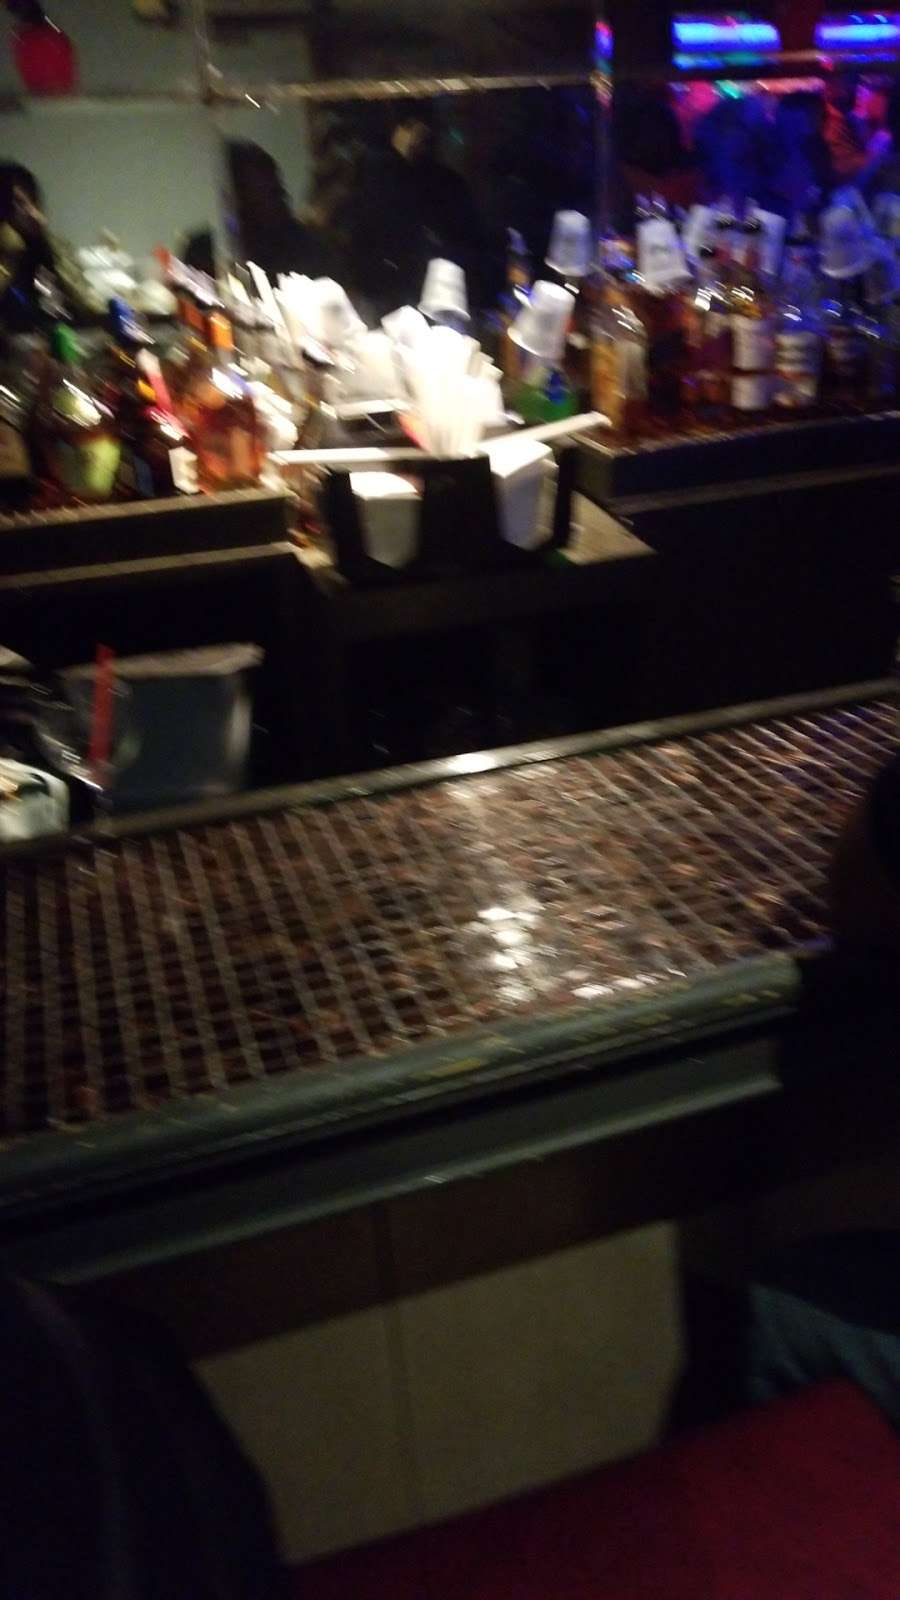 Lou & Choo Lounge - night club  | Photo 7 of 10 | Address: 2101 W Hunting Park Ave, Philadelphia, PA 19140, USA | Phone: (215) 228-7281